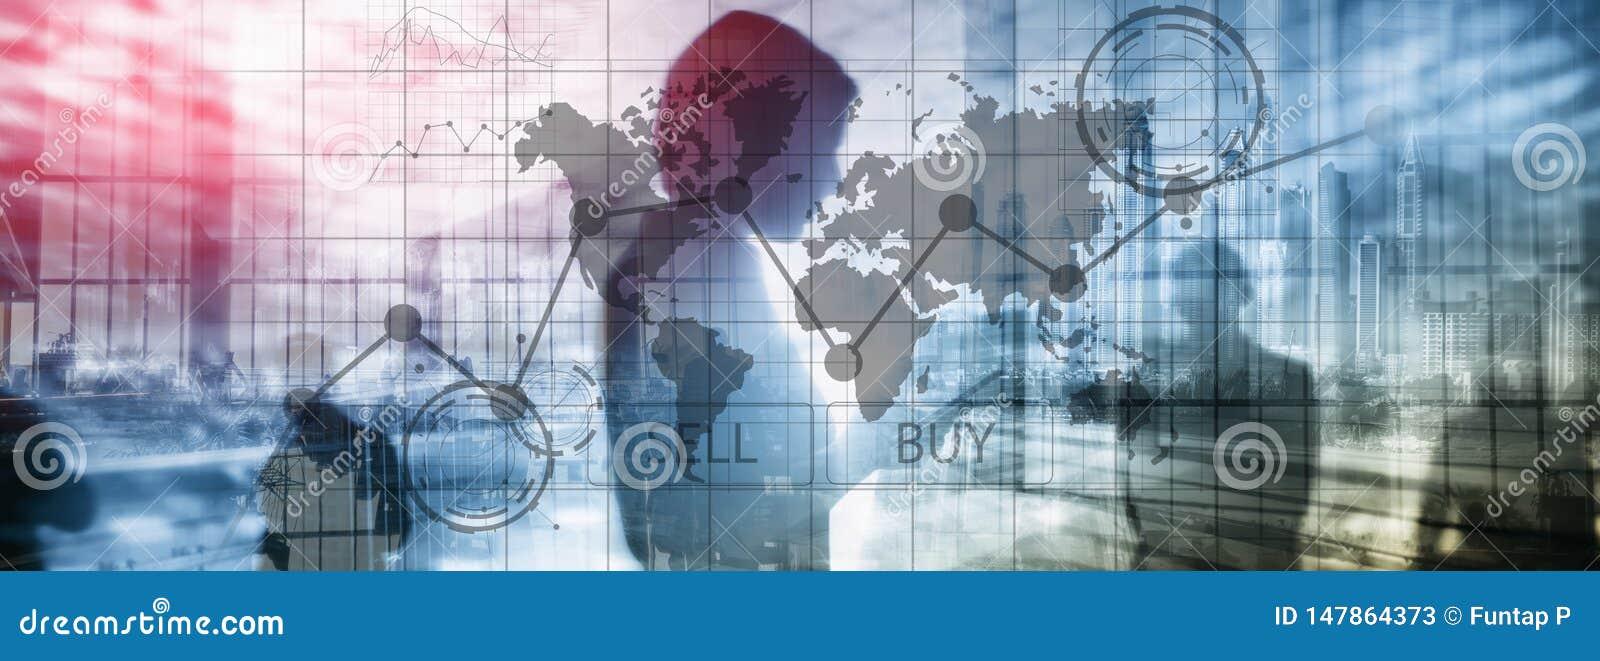 Forex Brokerage Technology – blogger.com